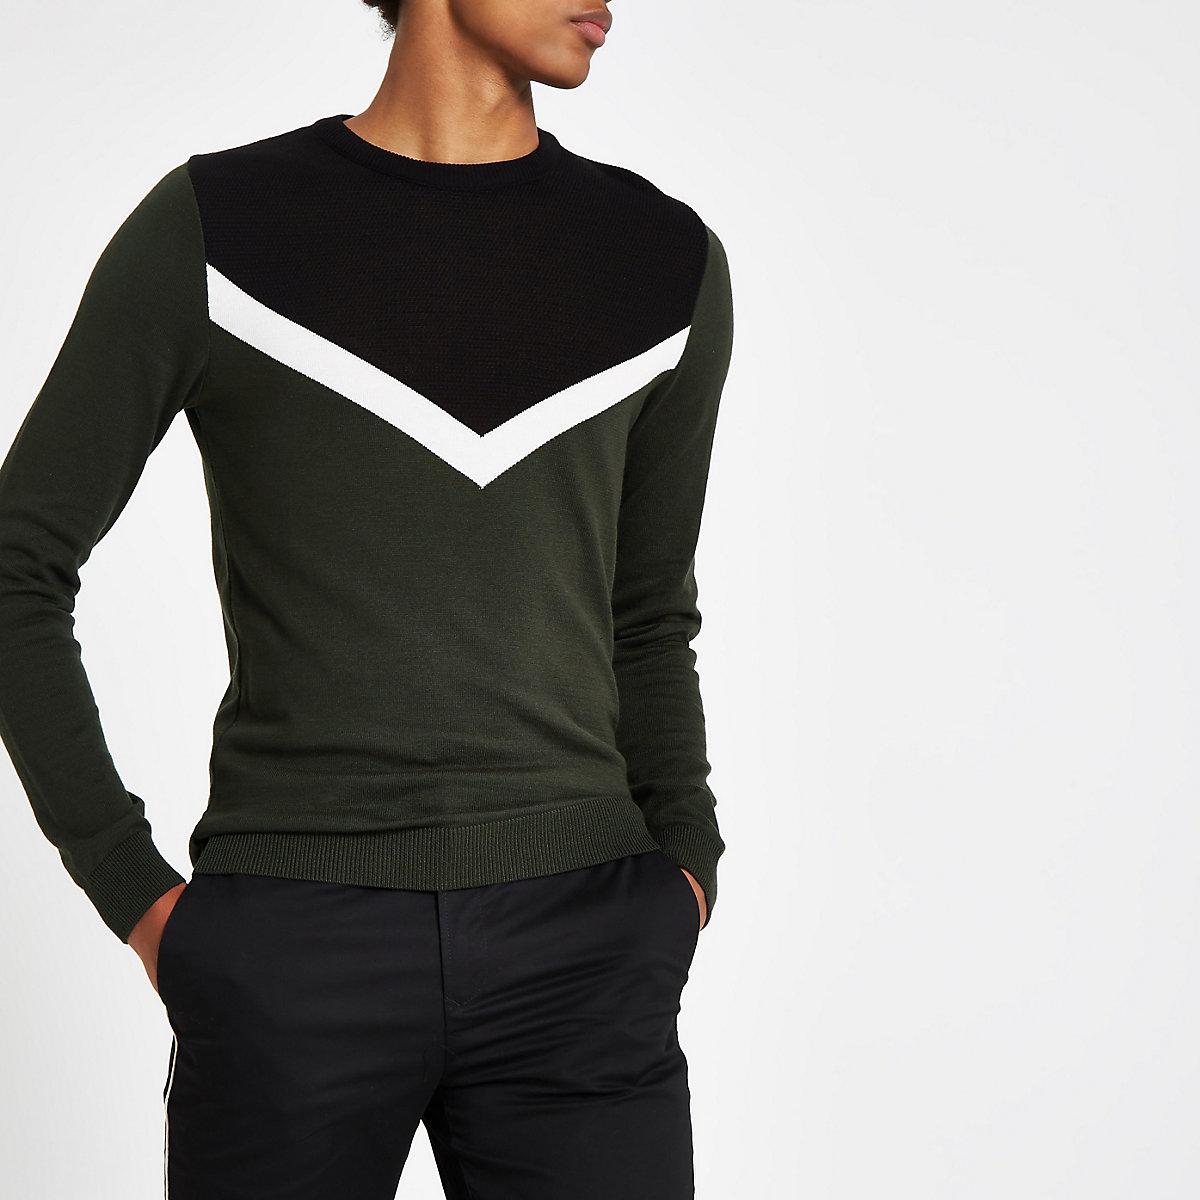 Green contrast crew neck jumper